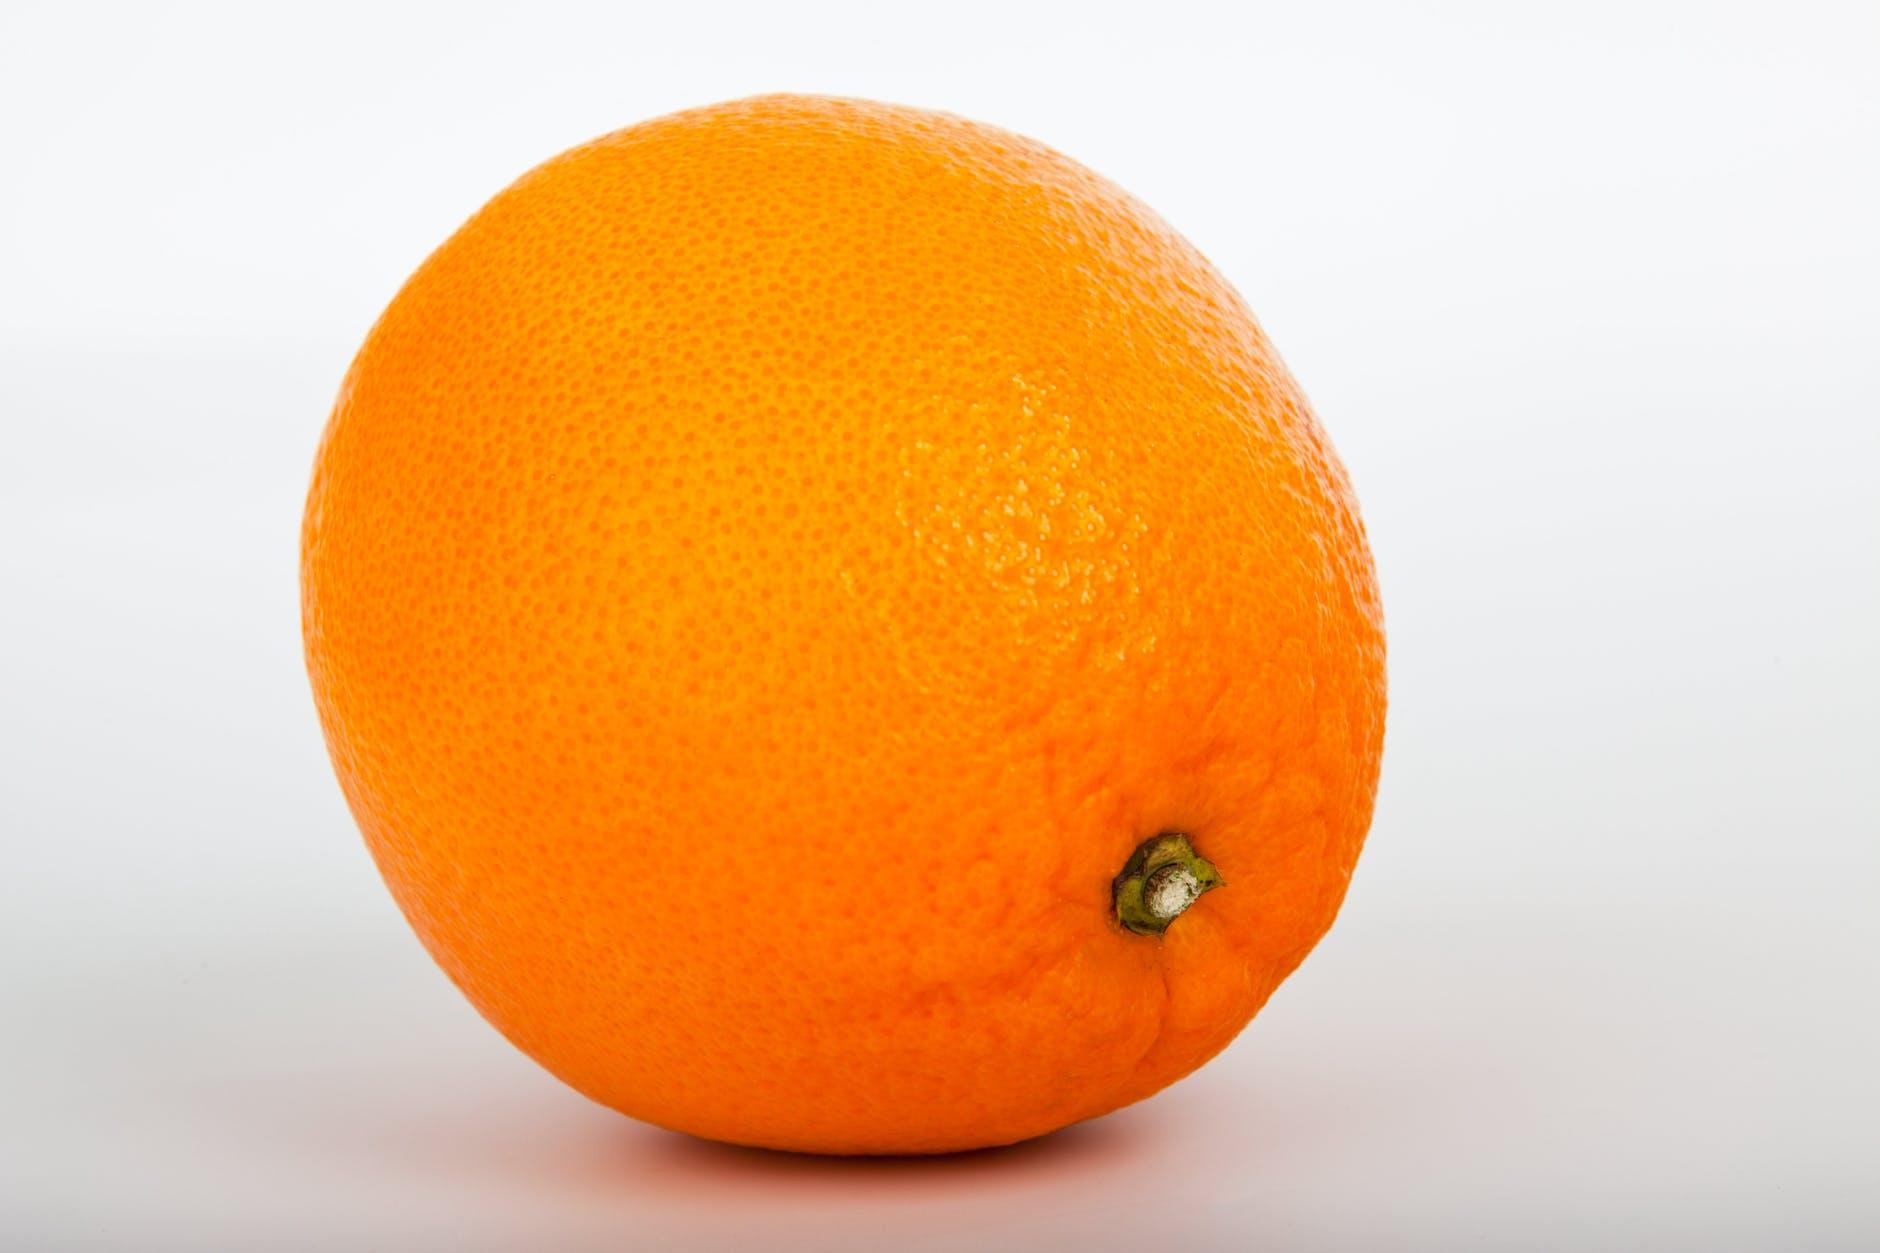 1602830496-citrus-diet-food-fresh-42059.jpeg